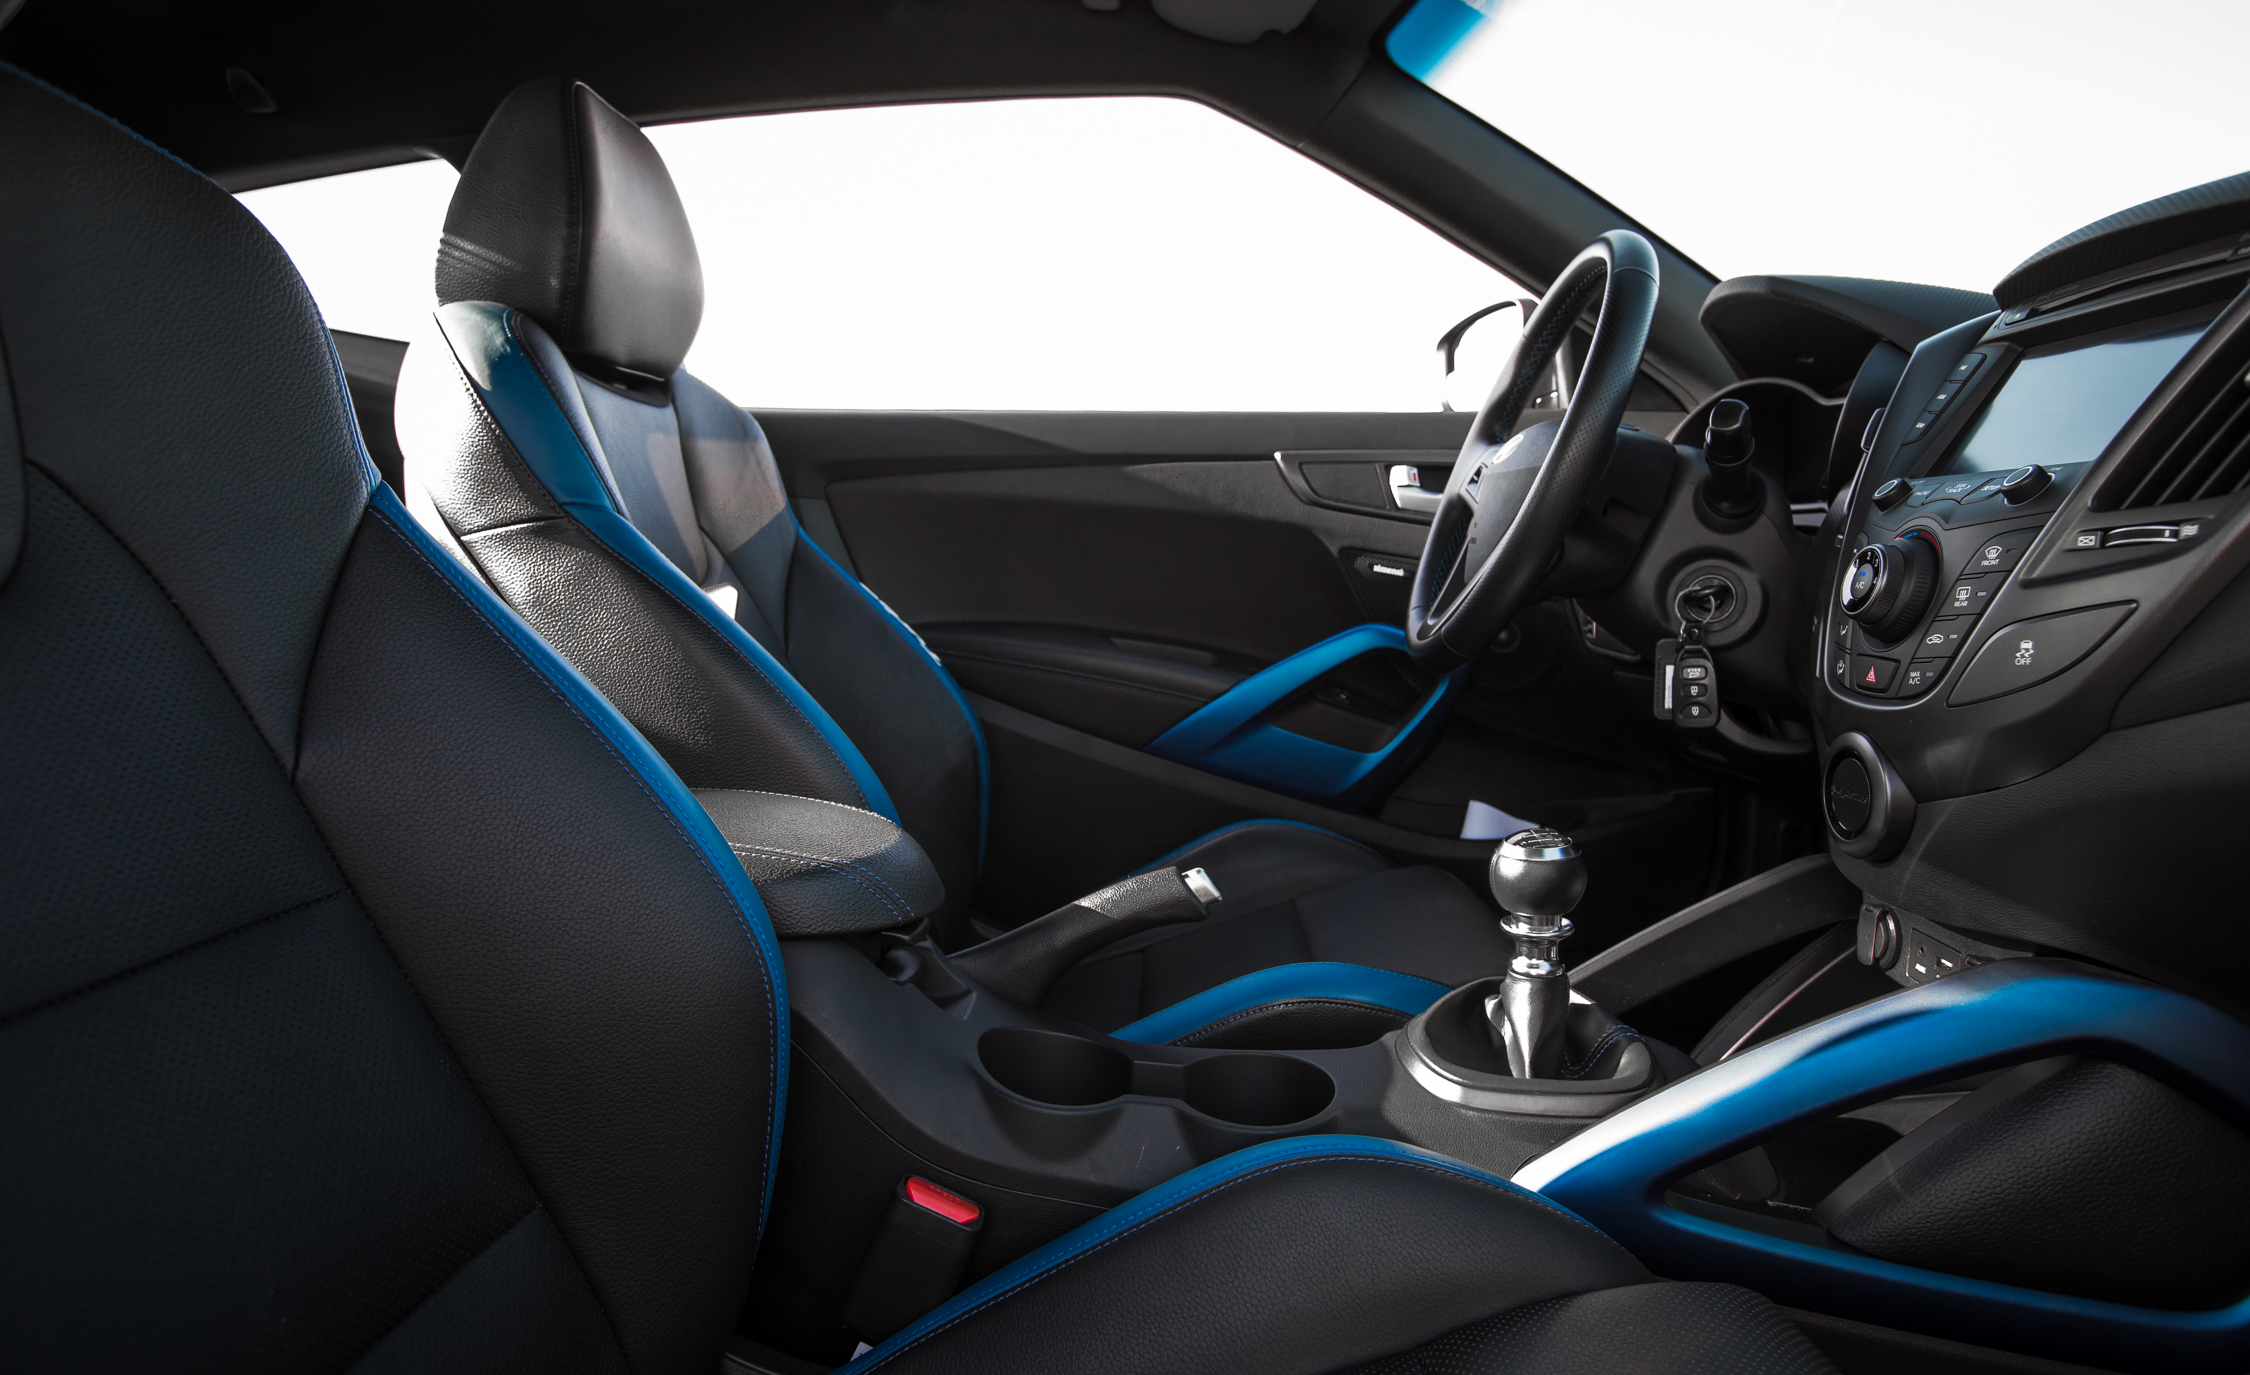 2016 Hyundai Veloster Turbo Rally Edition Interior Cockpit Seat